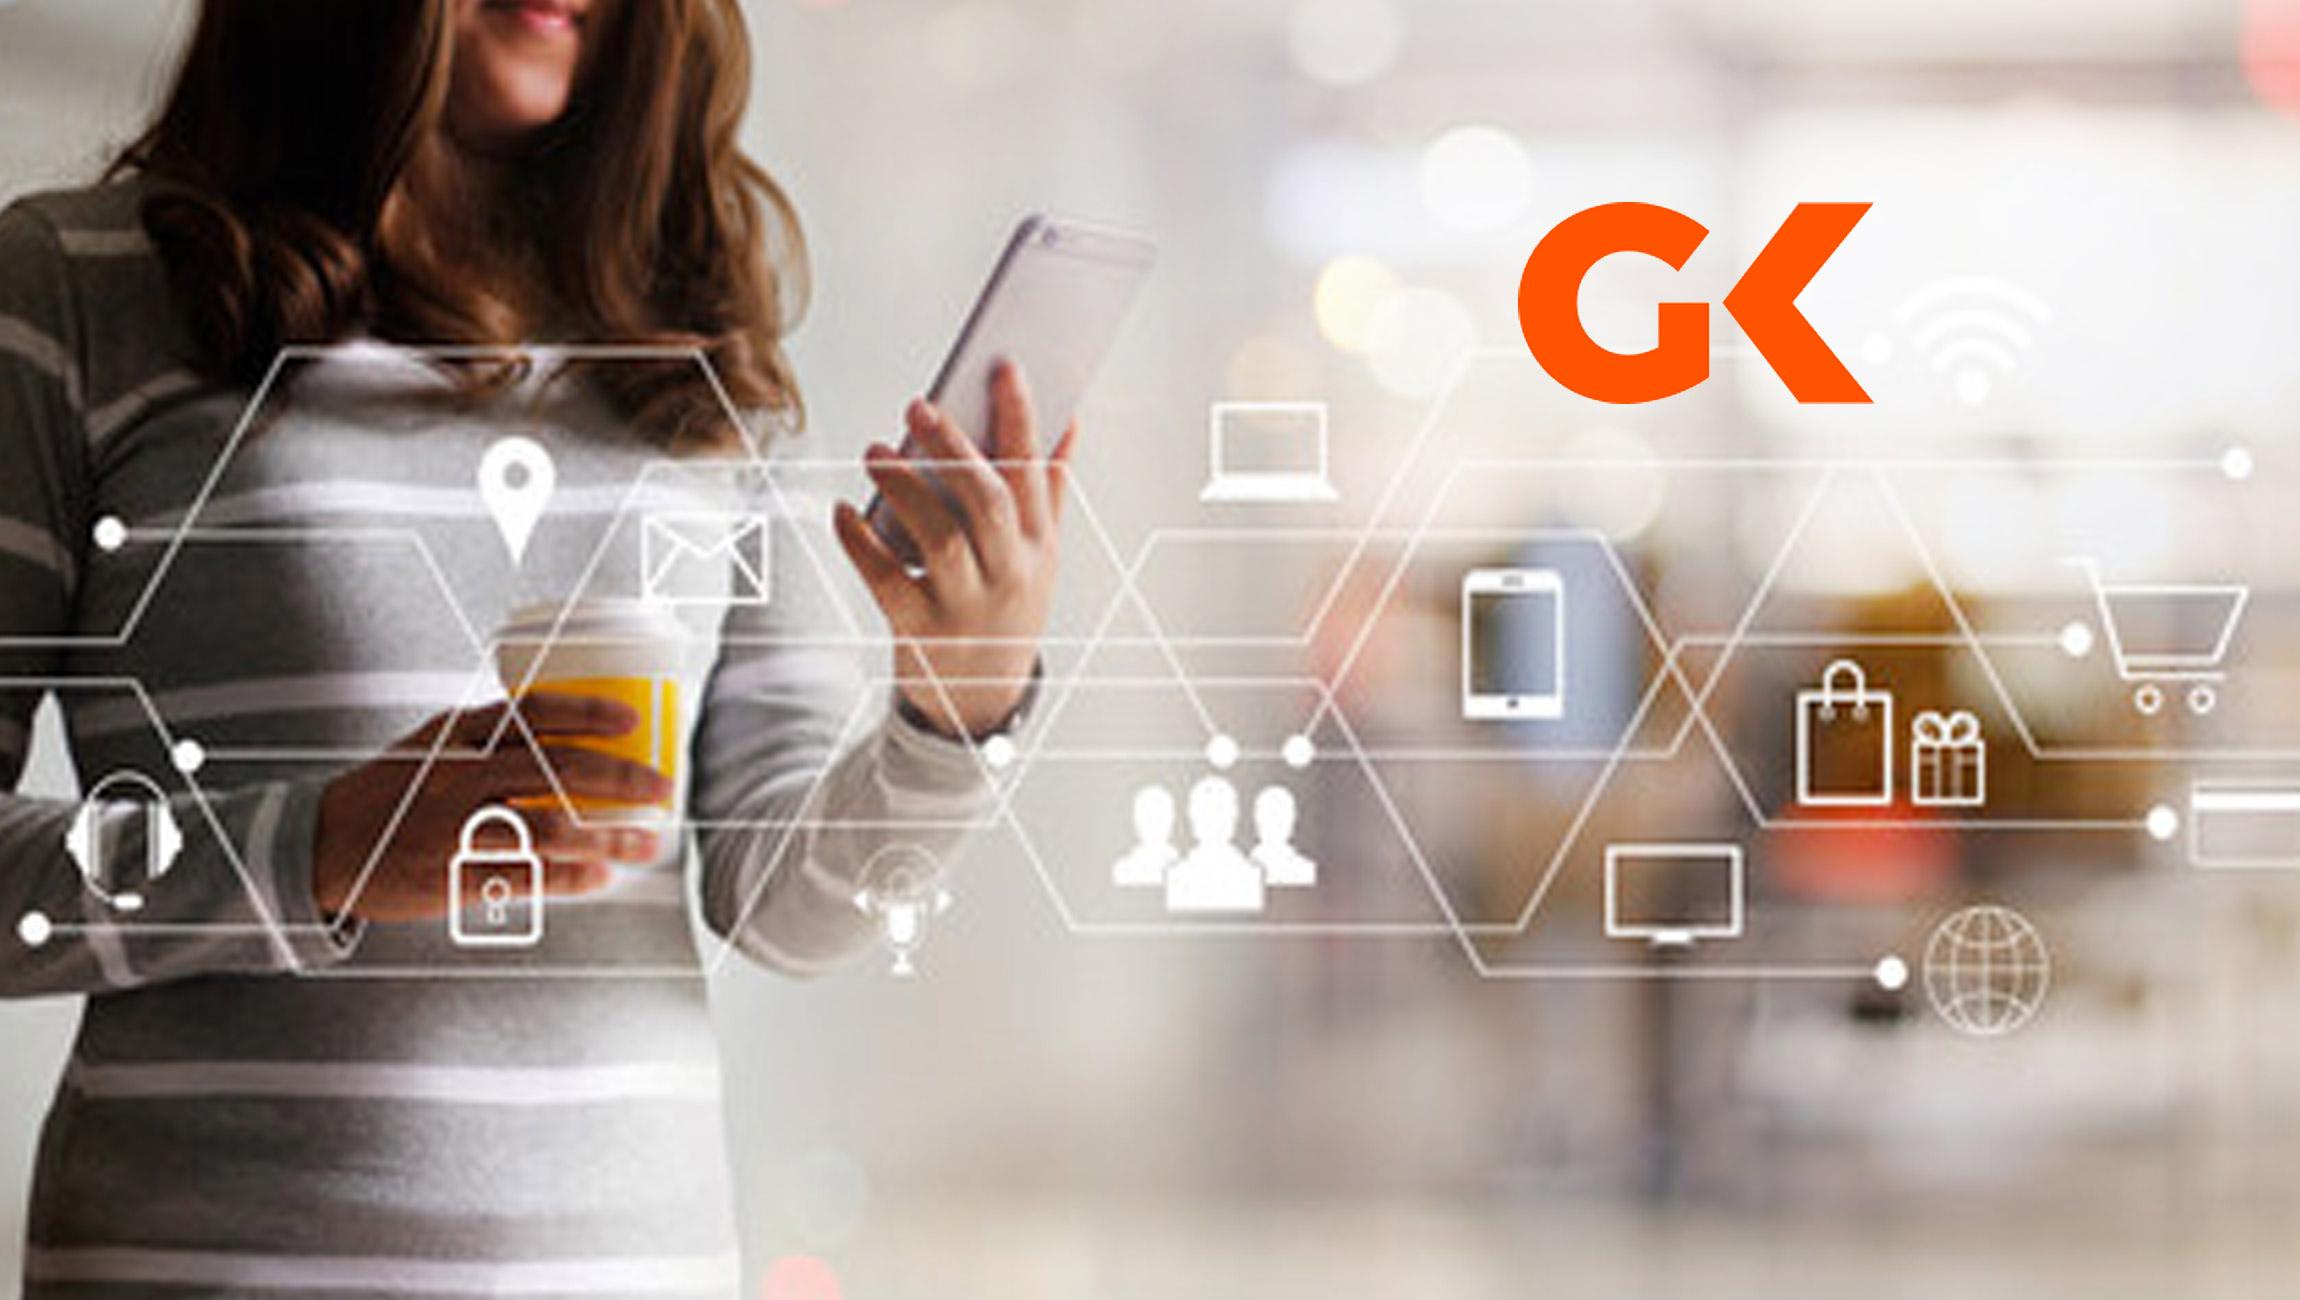 Fareway-Joins-the-GrocerKey-Retail-Media-Network